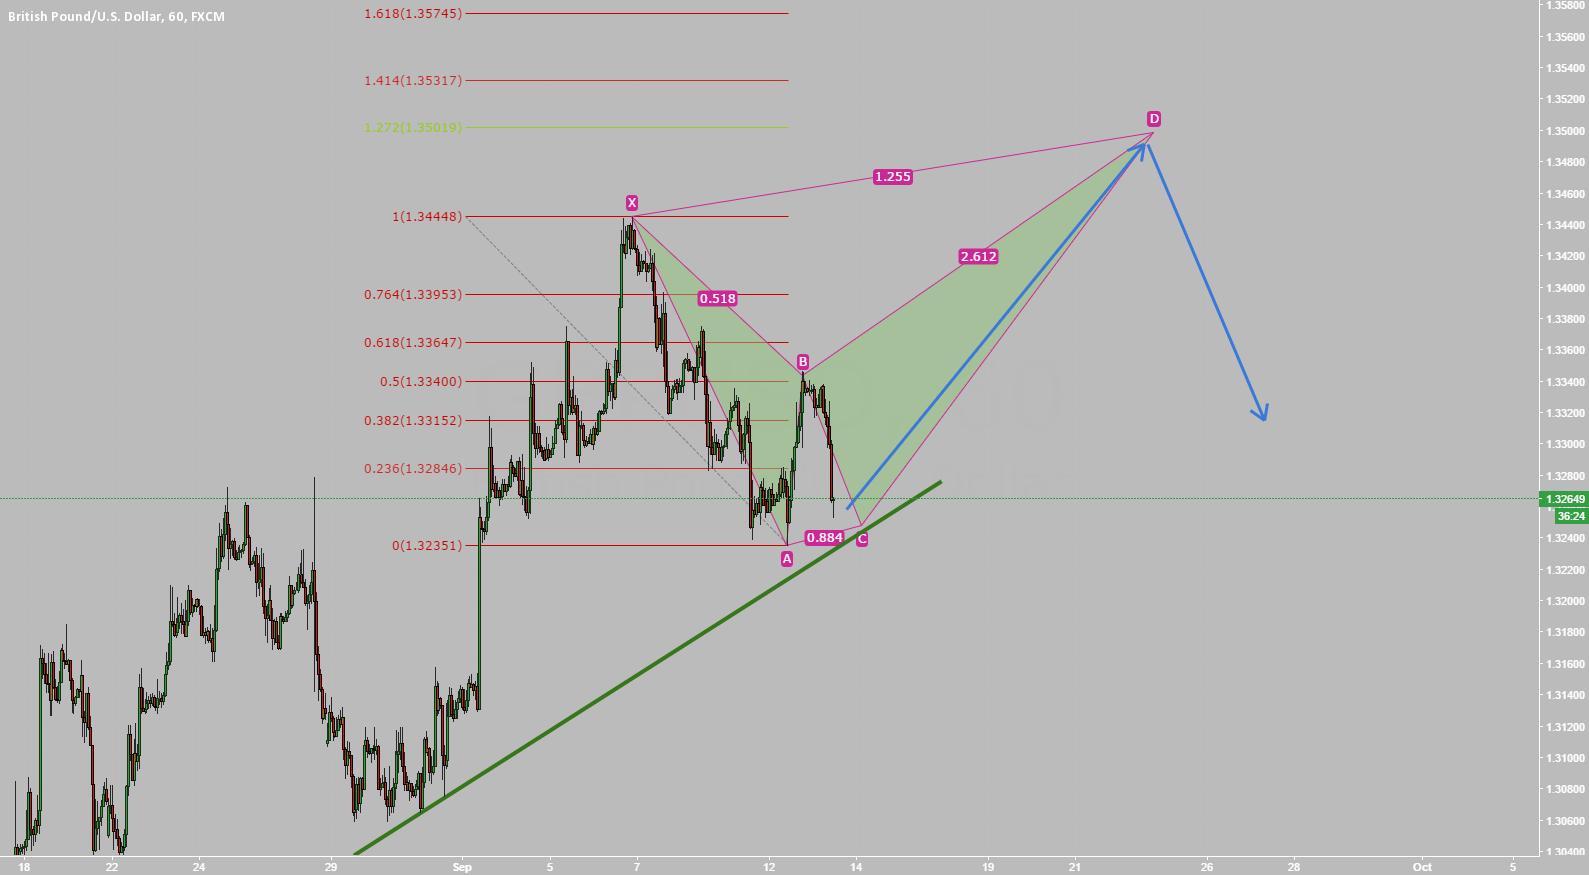 GBP/USD Bearish Bat Pattern